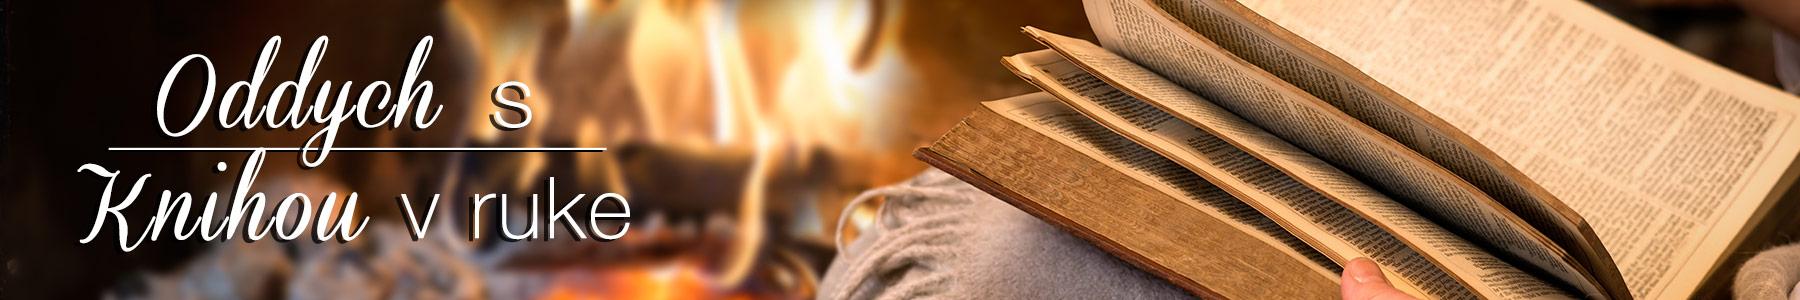 Oddych s knihou v ruke